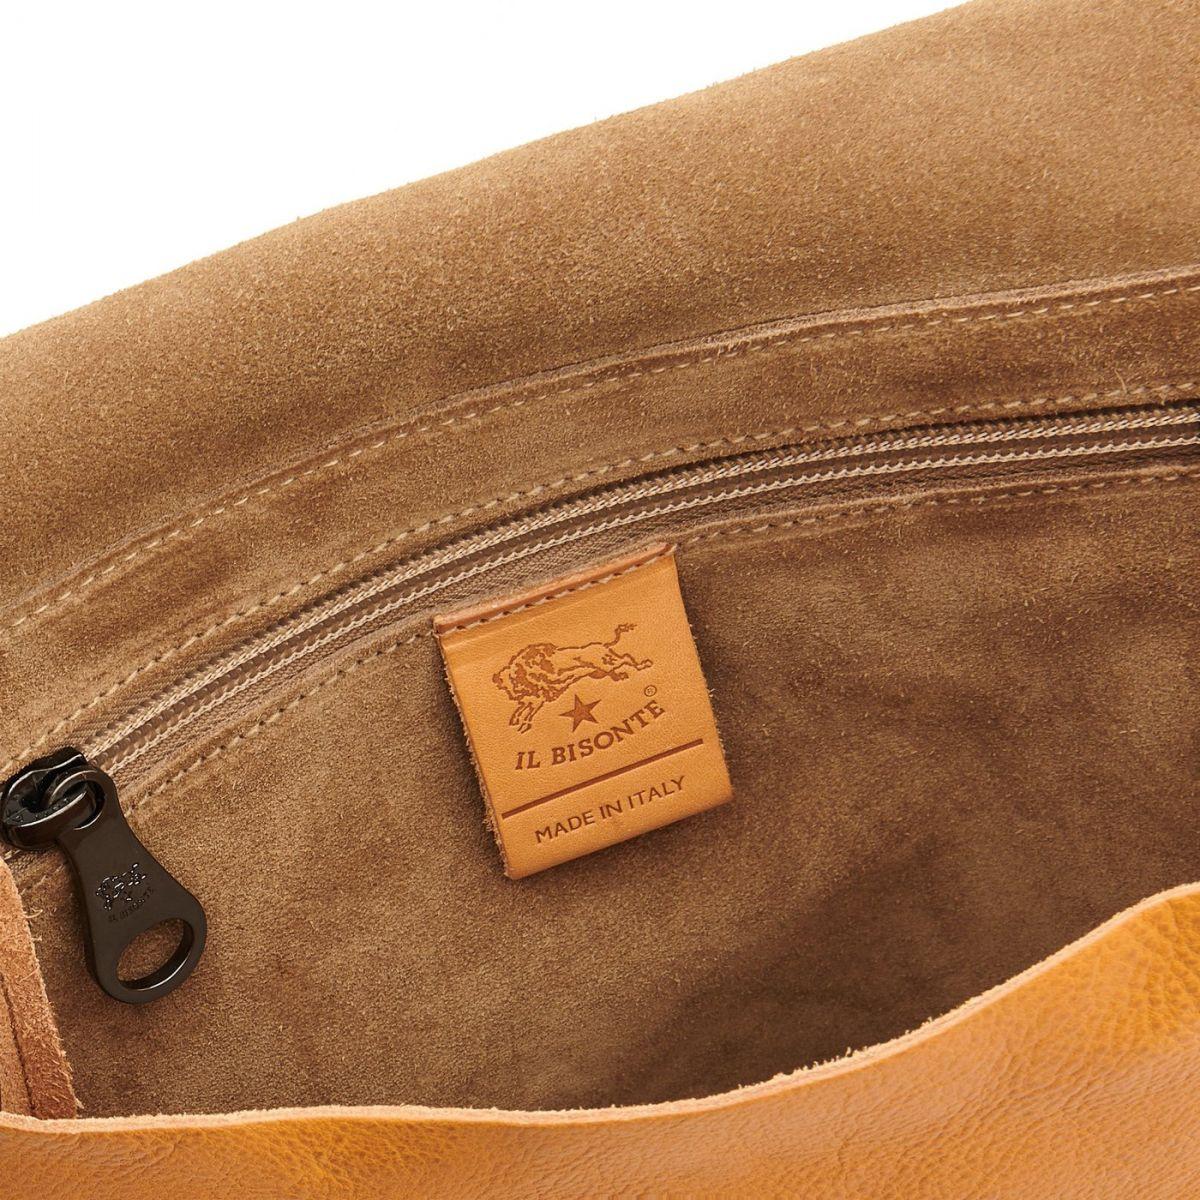 Men's Crossbody Bag Narciso in Vintage Cowhide Leather BCR194 color Natural | Details